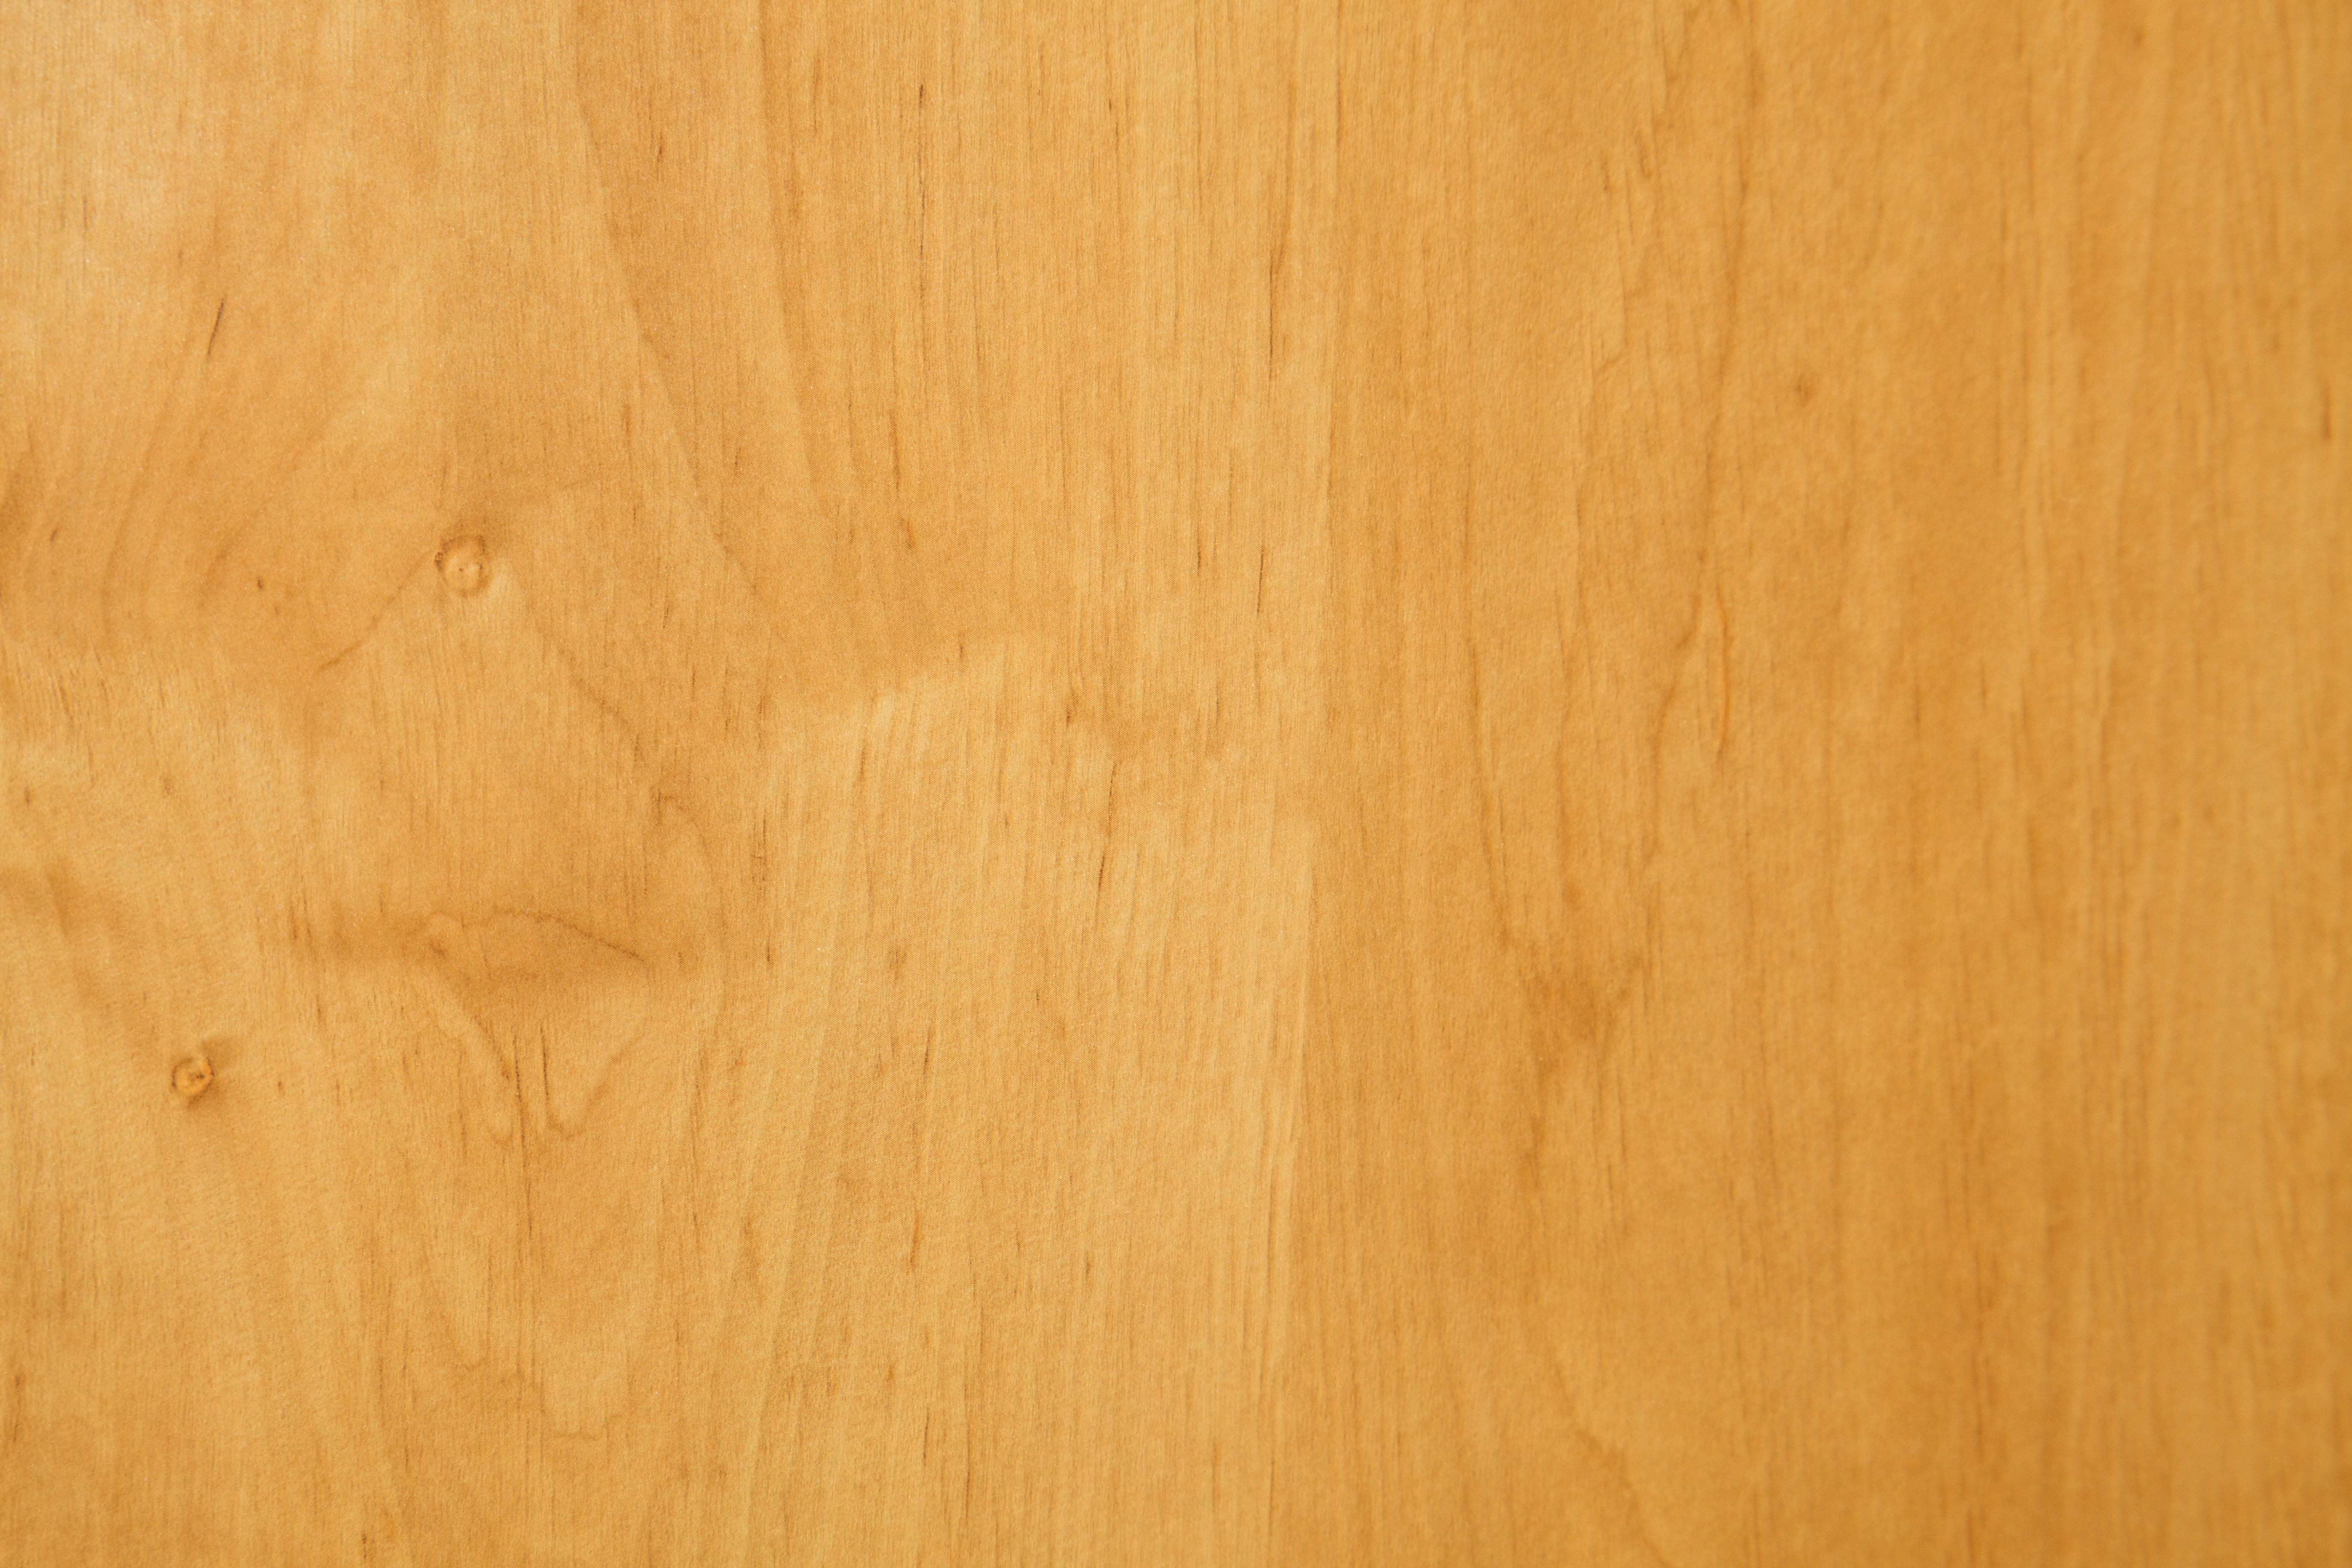 Light Wood Texture | Dominion Payroll